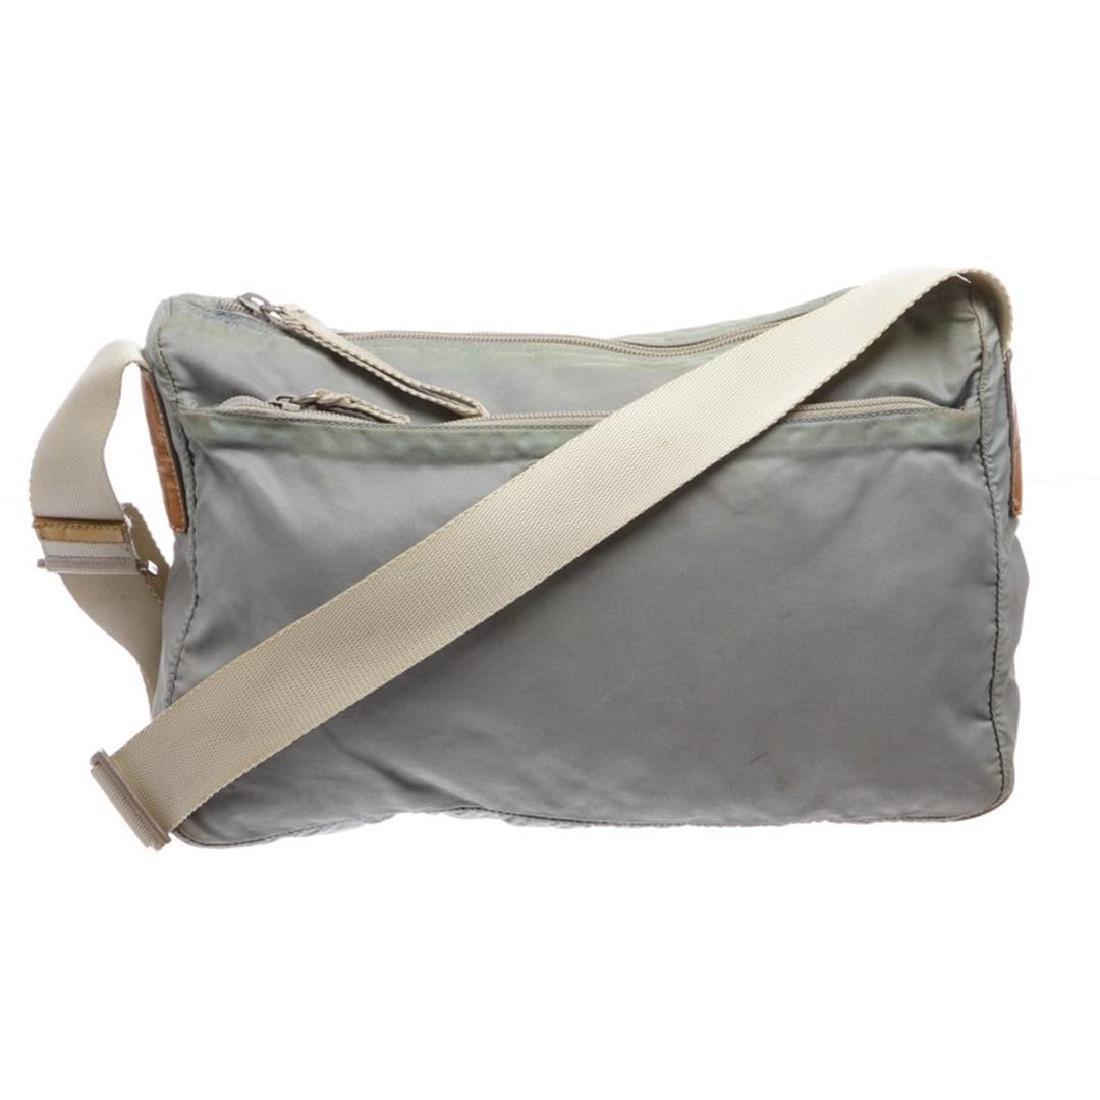 Prada Gray Nylon Zip Top Messenger Handbag